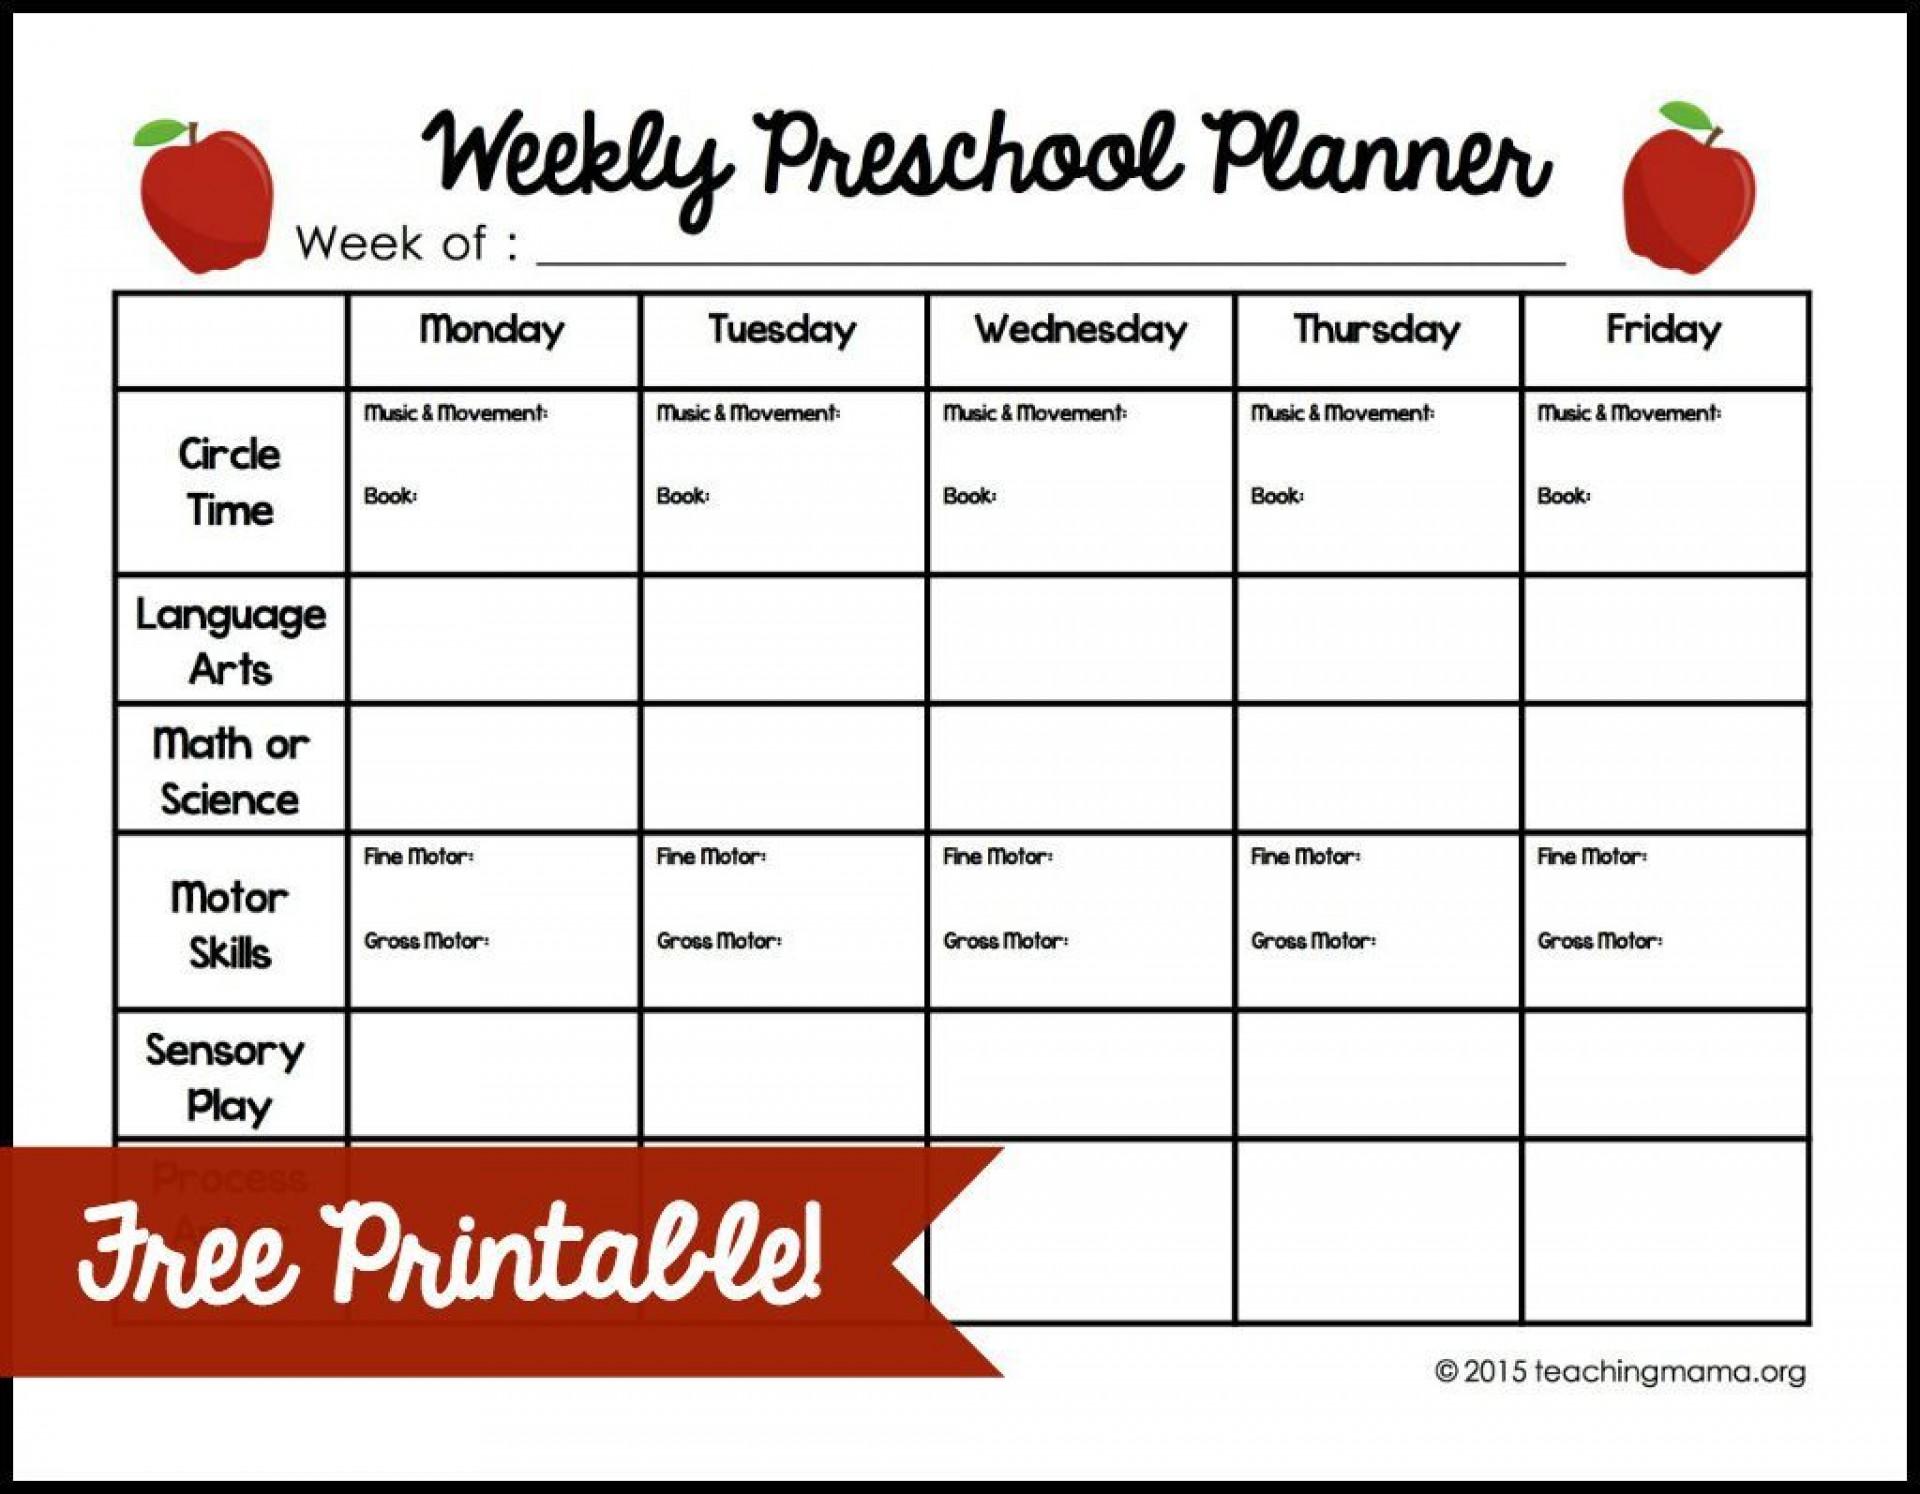 009 Striking Preschool Lesson Plan Template Highest Quality  Free Printable Creative Curriculum Doc1920